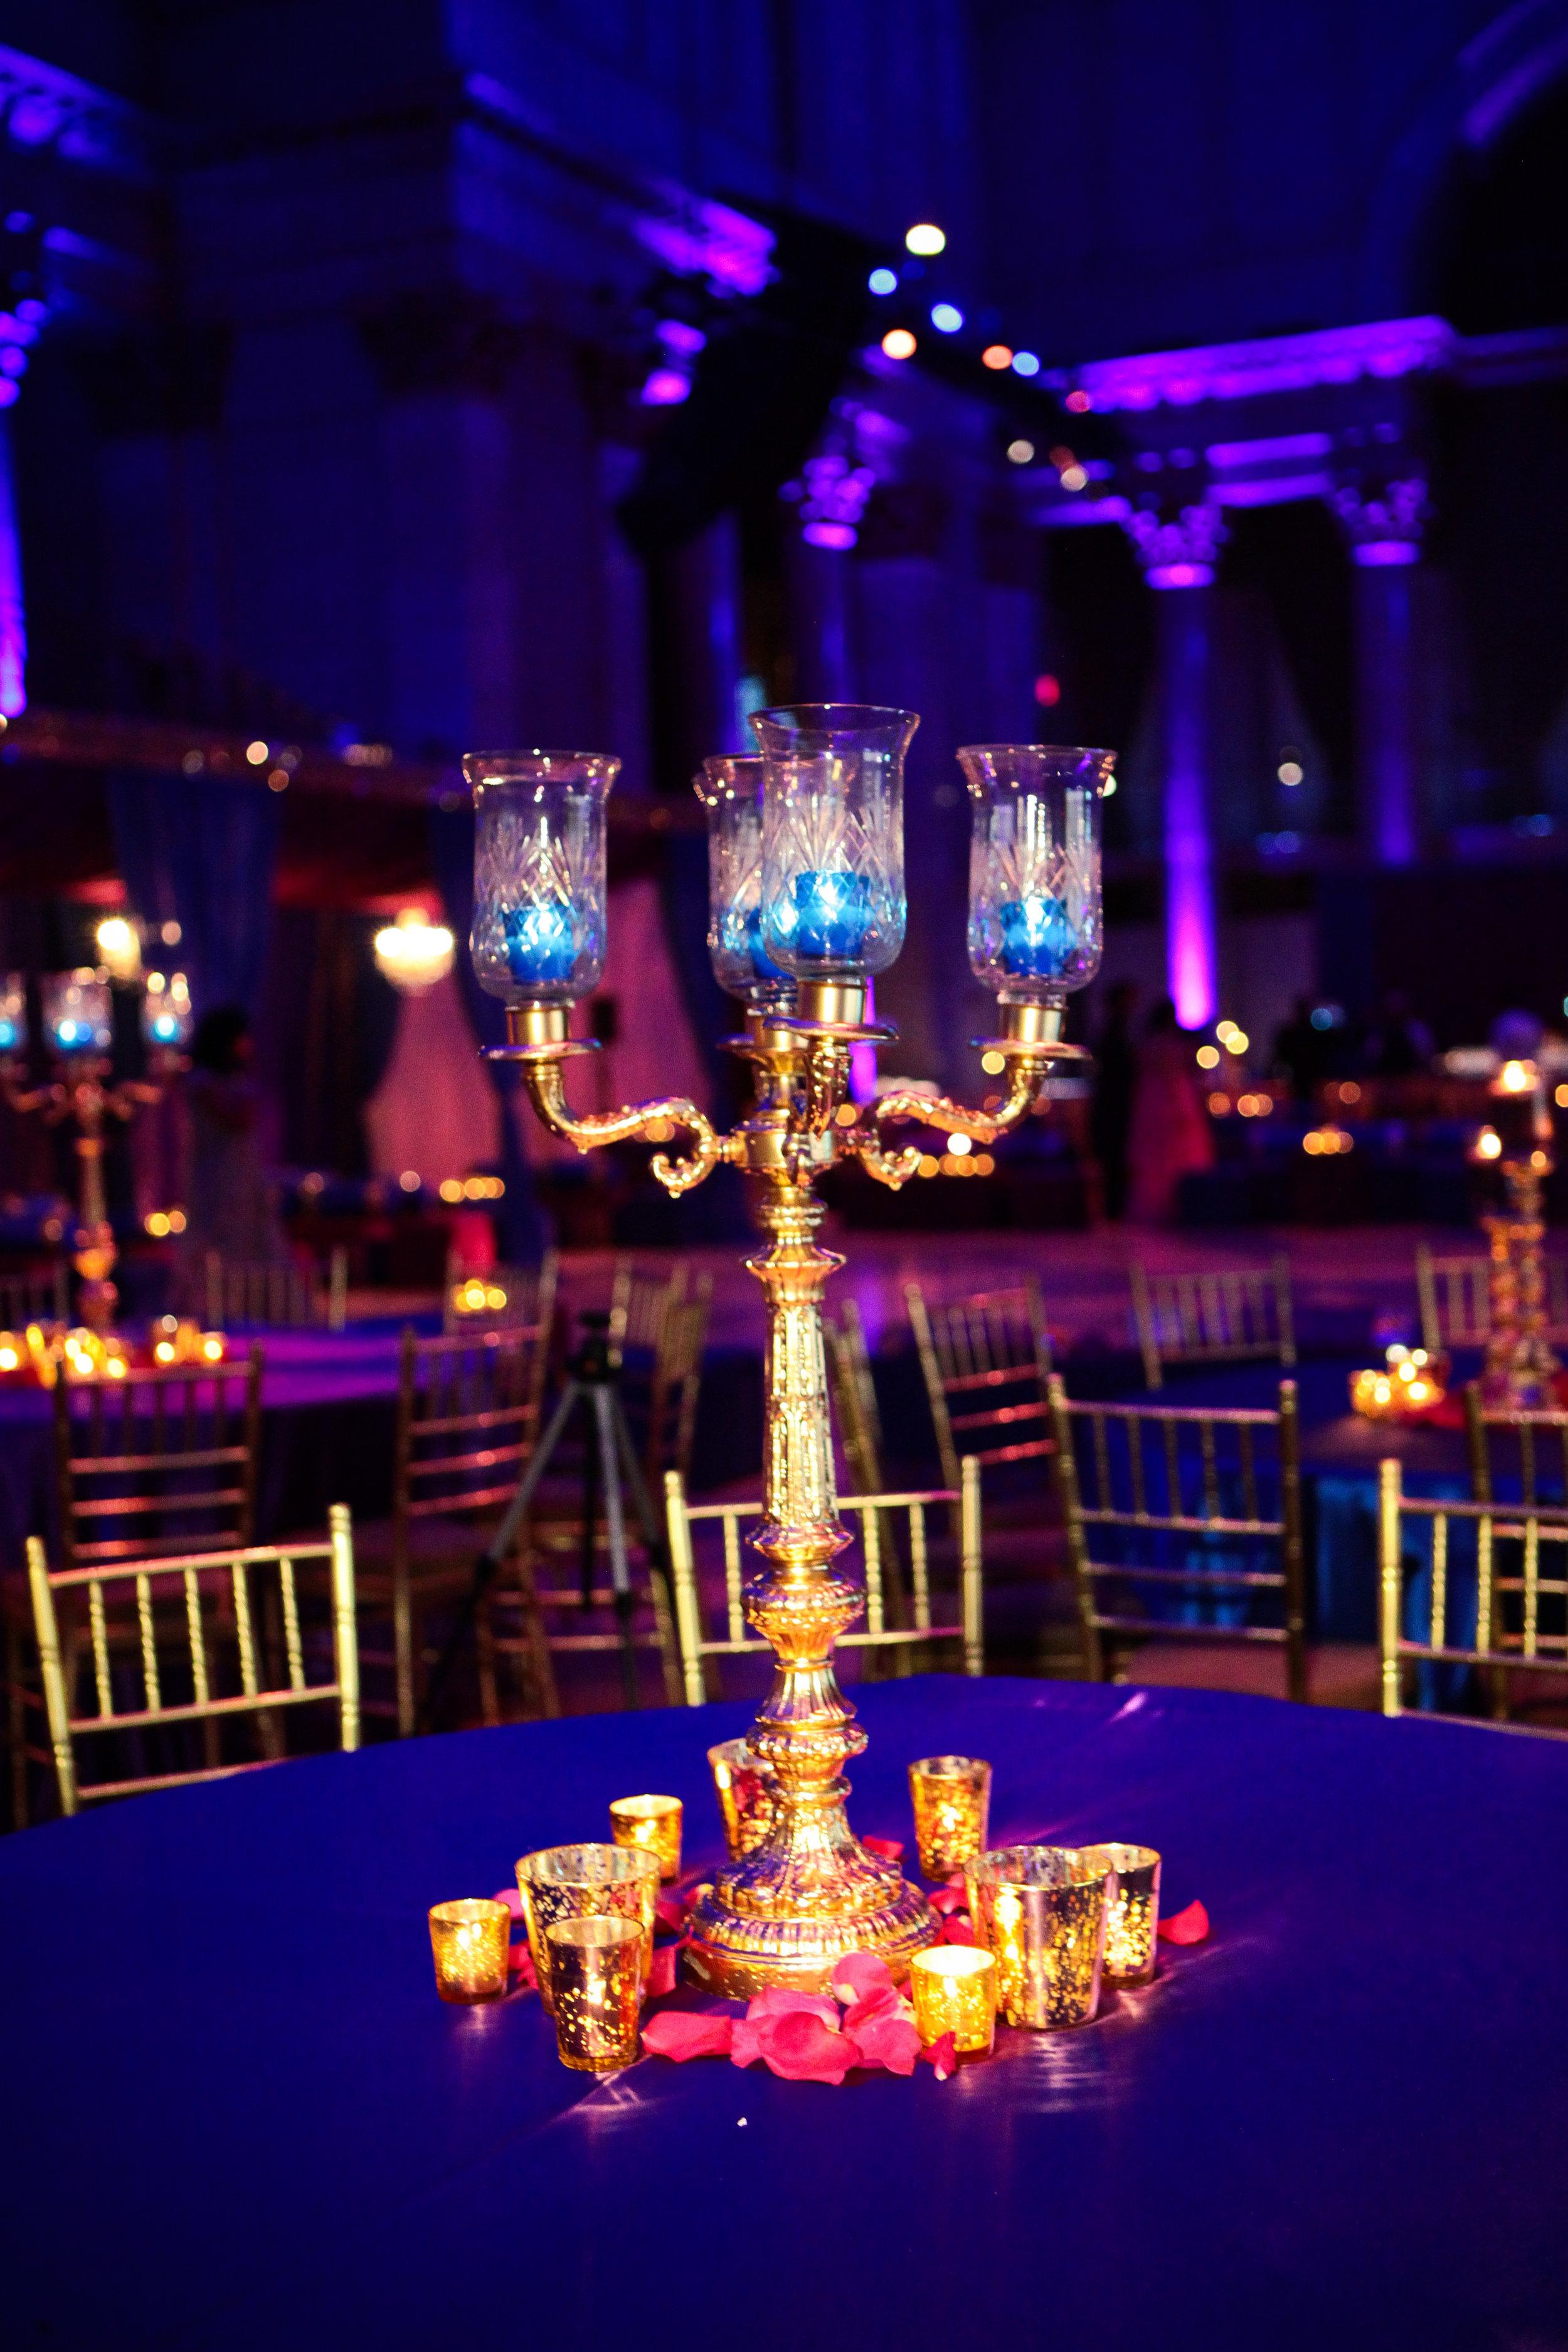 Gold Candelabra in Blue in Purple Room